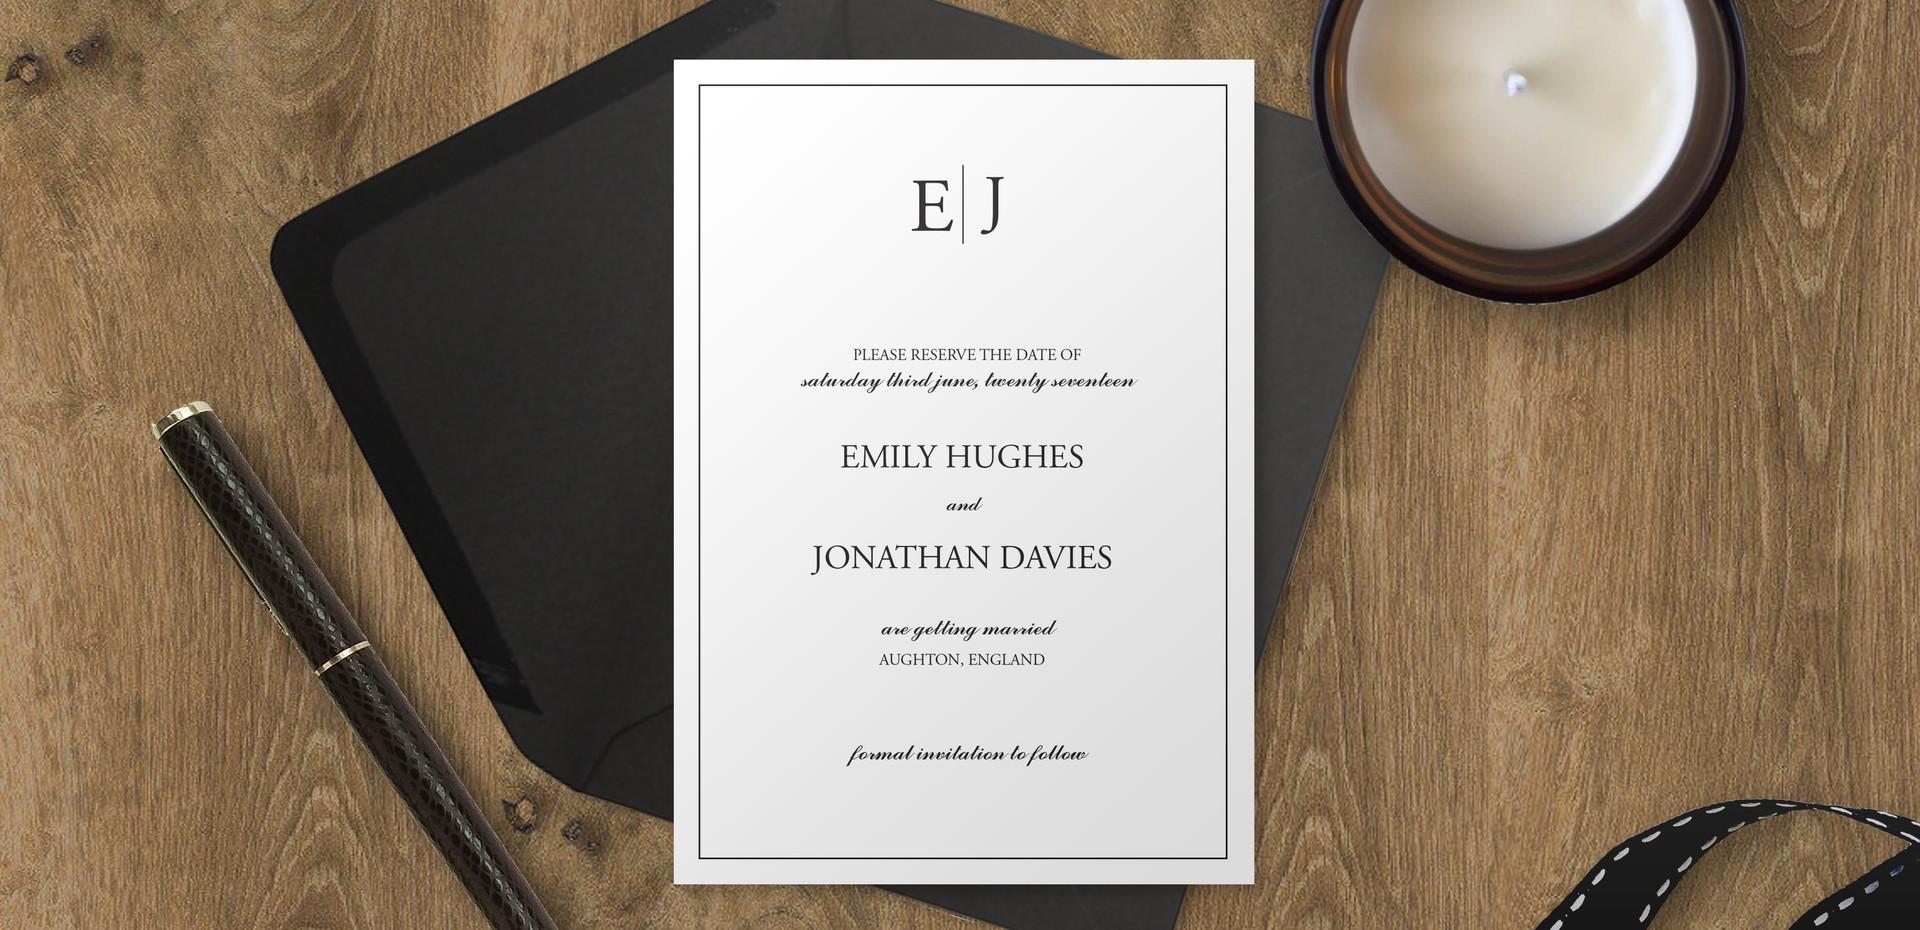 Sophisticated Monogram Bespoke Wedding Invitations, Save the Dates, RSVPs and Wedding Menus personalised wedding stationery by Bespoke Invites